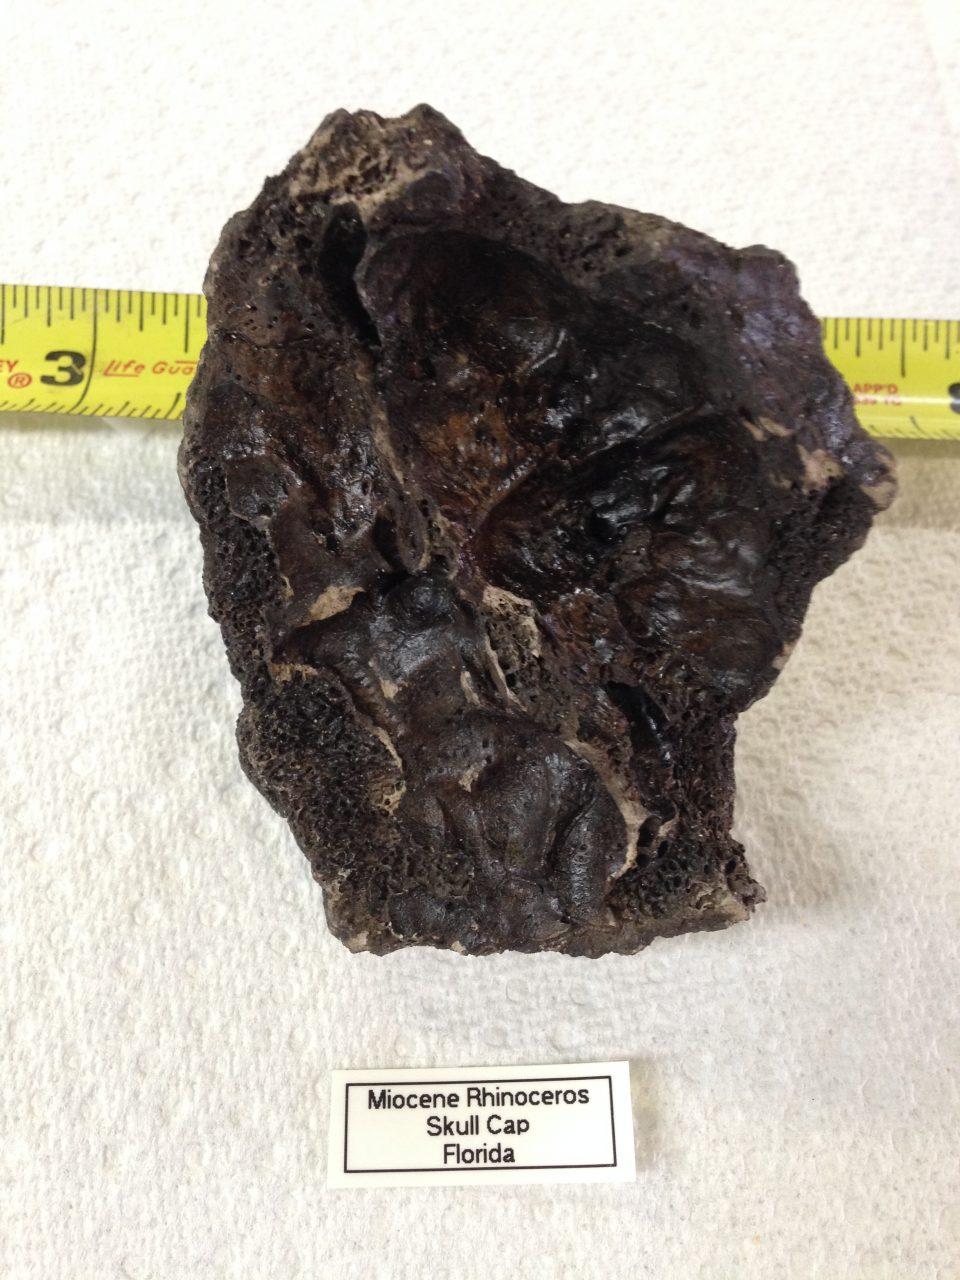 Rhinoceros Menoceras barbouri Skull Cap | Fossils & Artifacts for Sale | Paleo Enterprises | Fossils & Artifacts for Sale